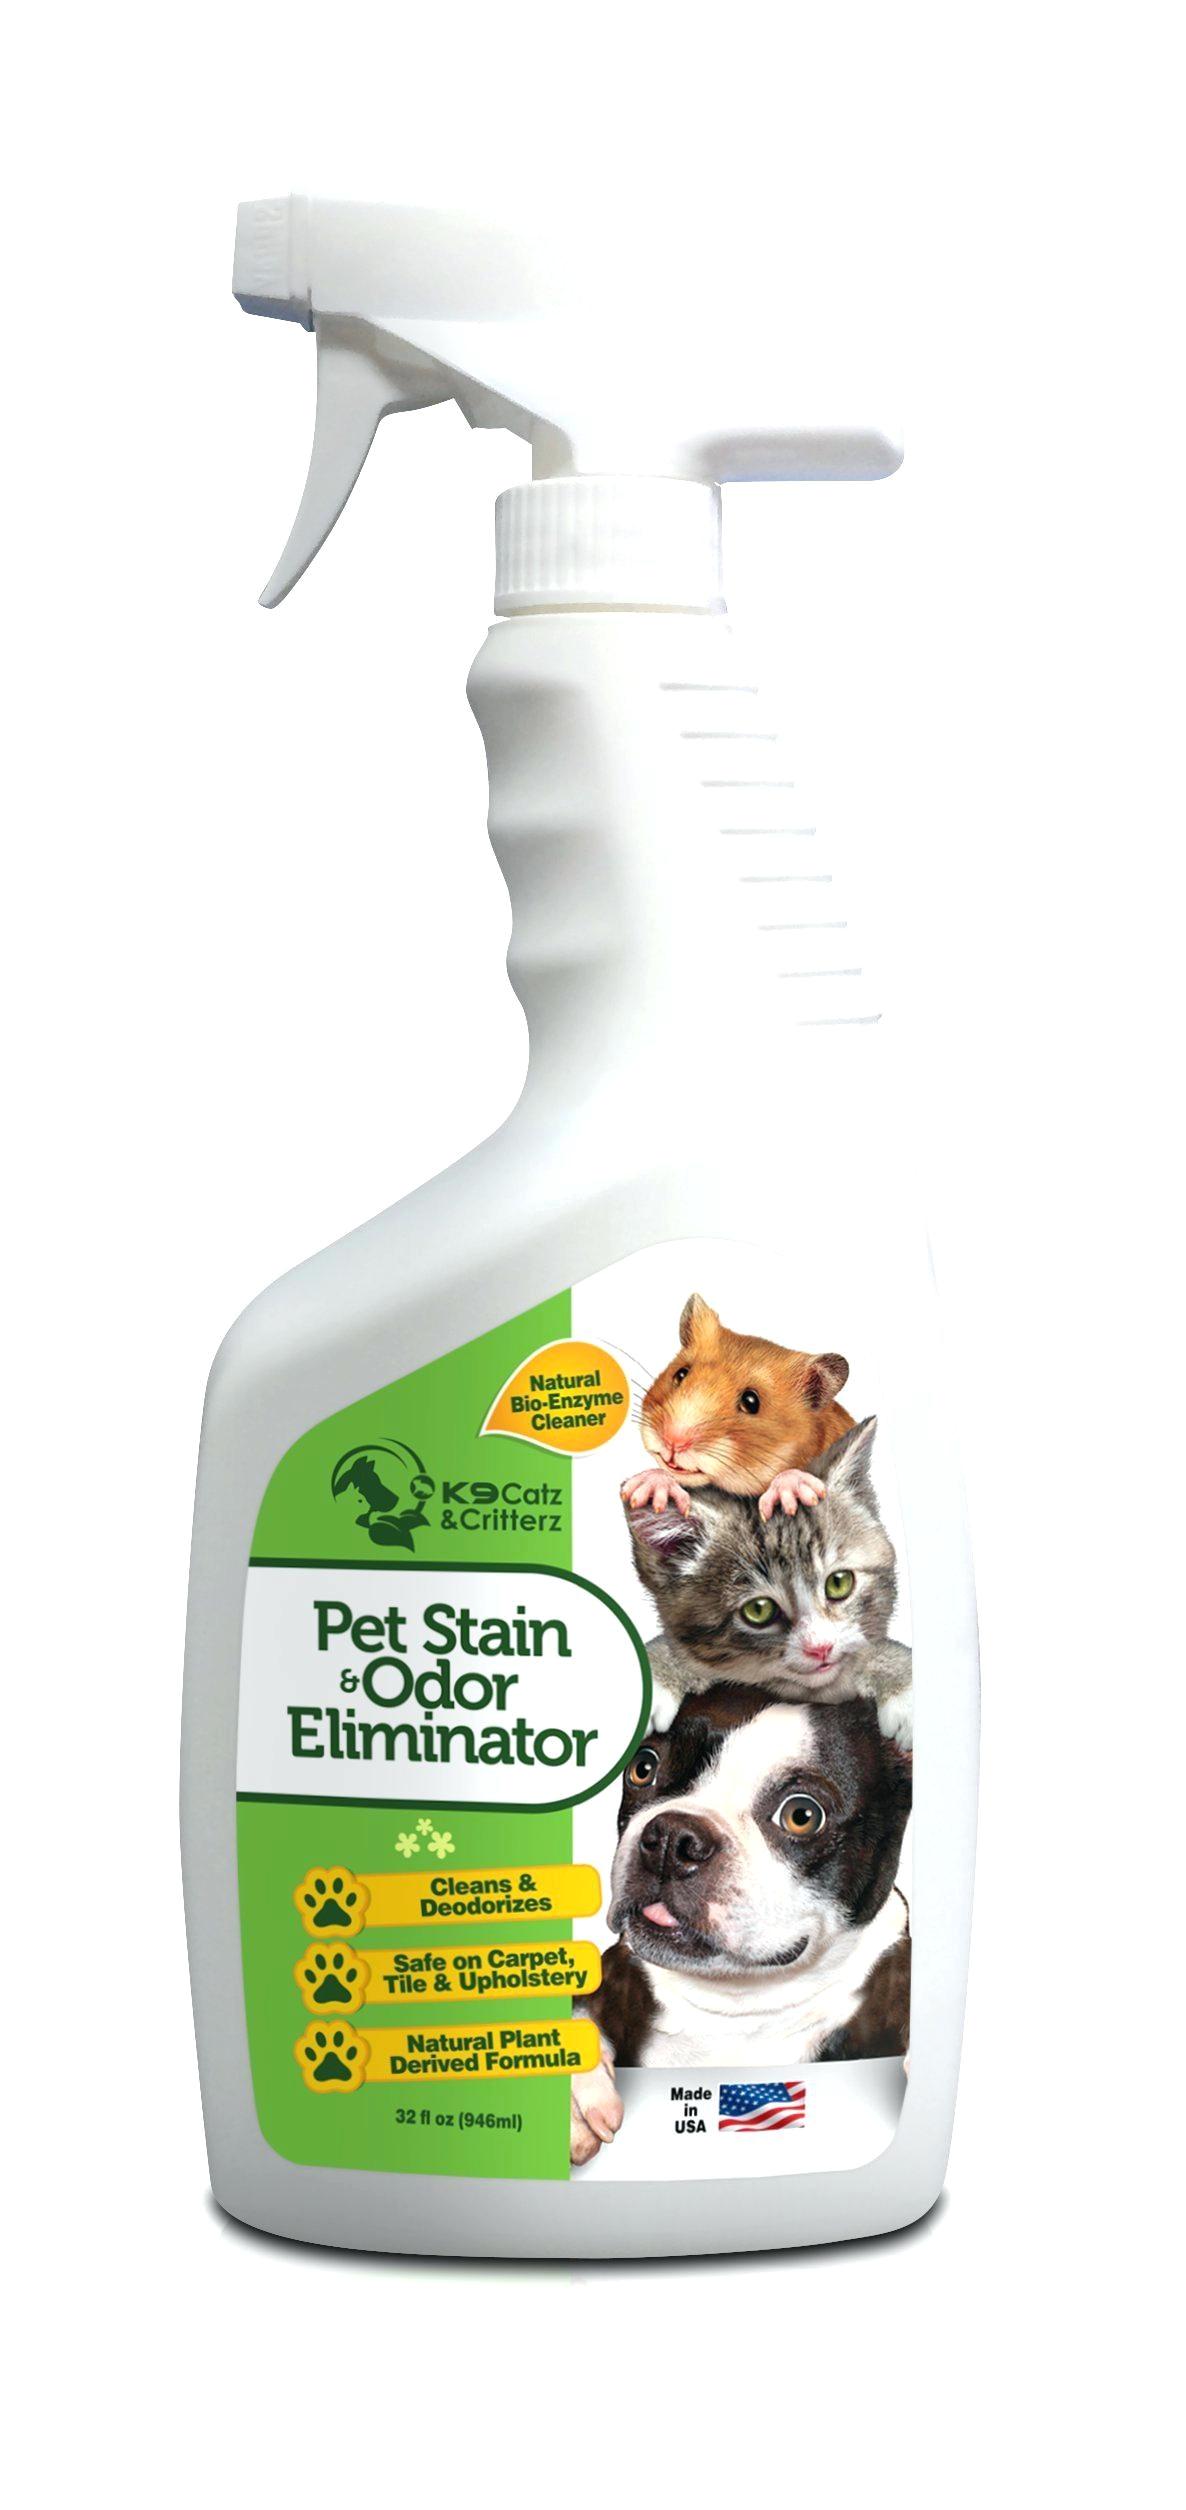 Steam Floor Cleaners Walmart Rug Doctor Walmart Reviews Best Of Pet